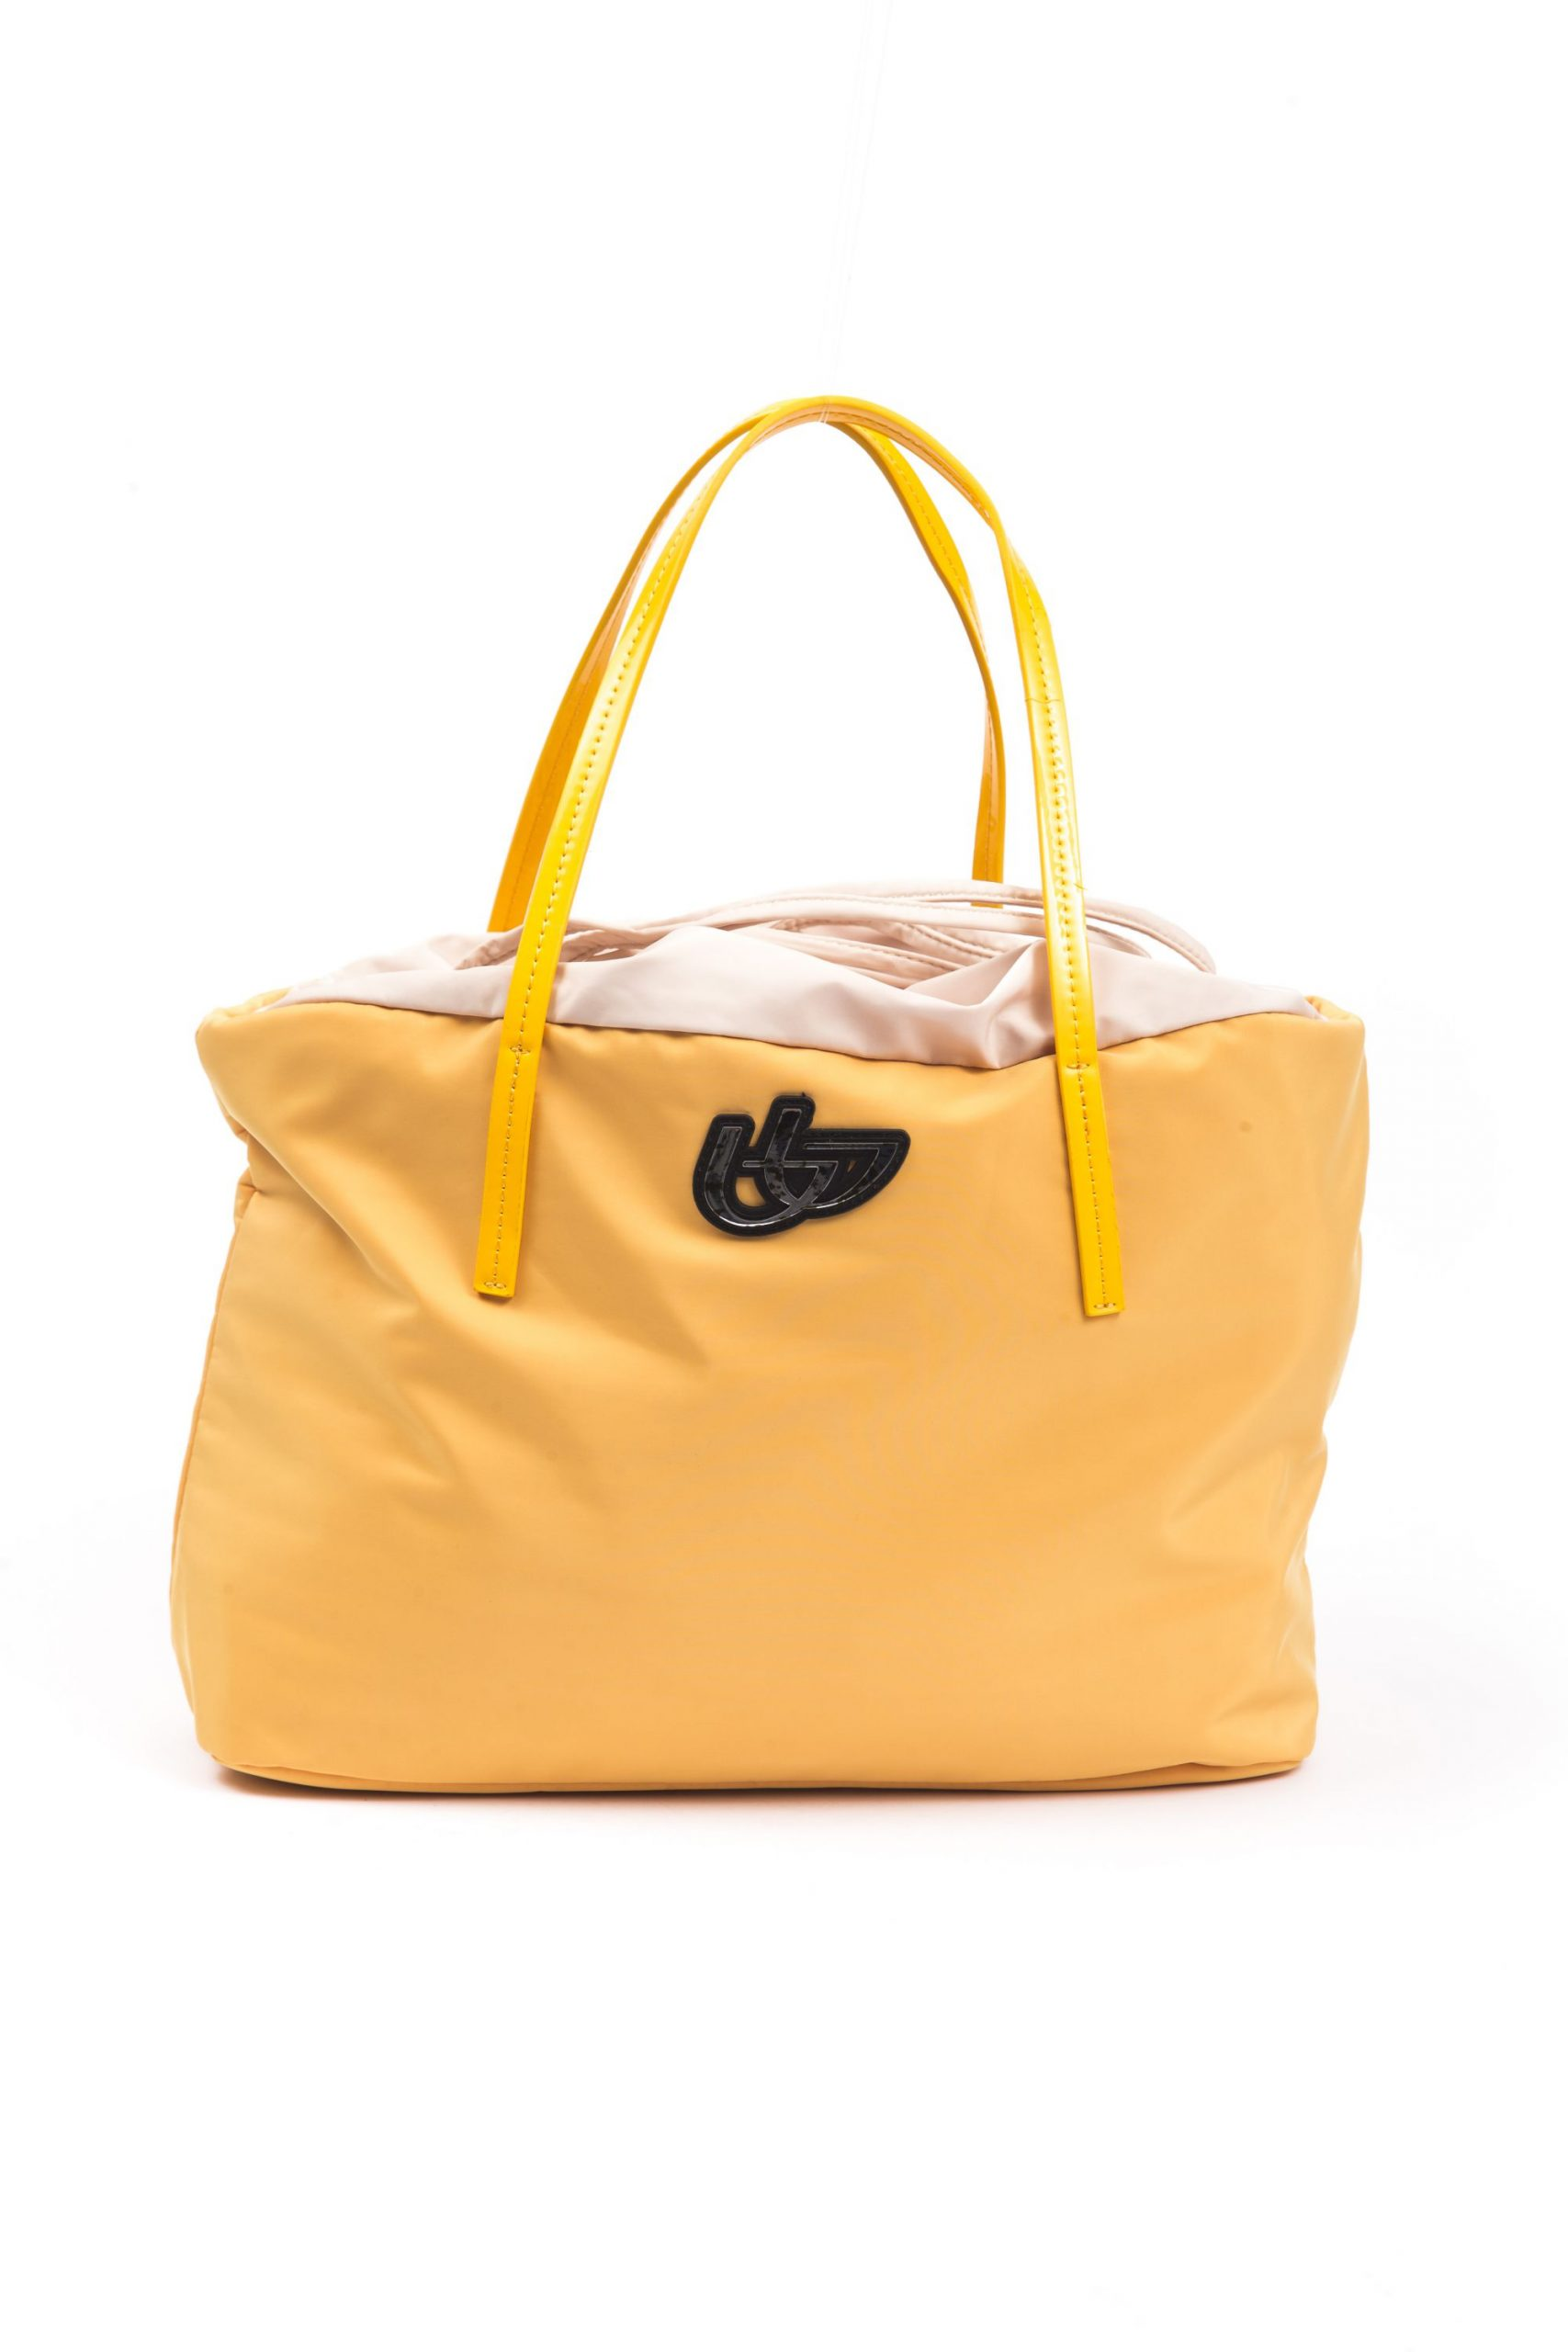 Byblos Women's Shopping Handbag Yellow BY665691